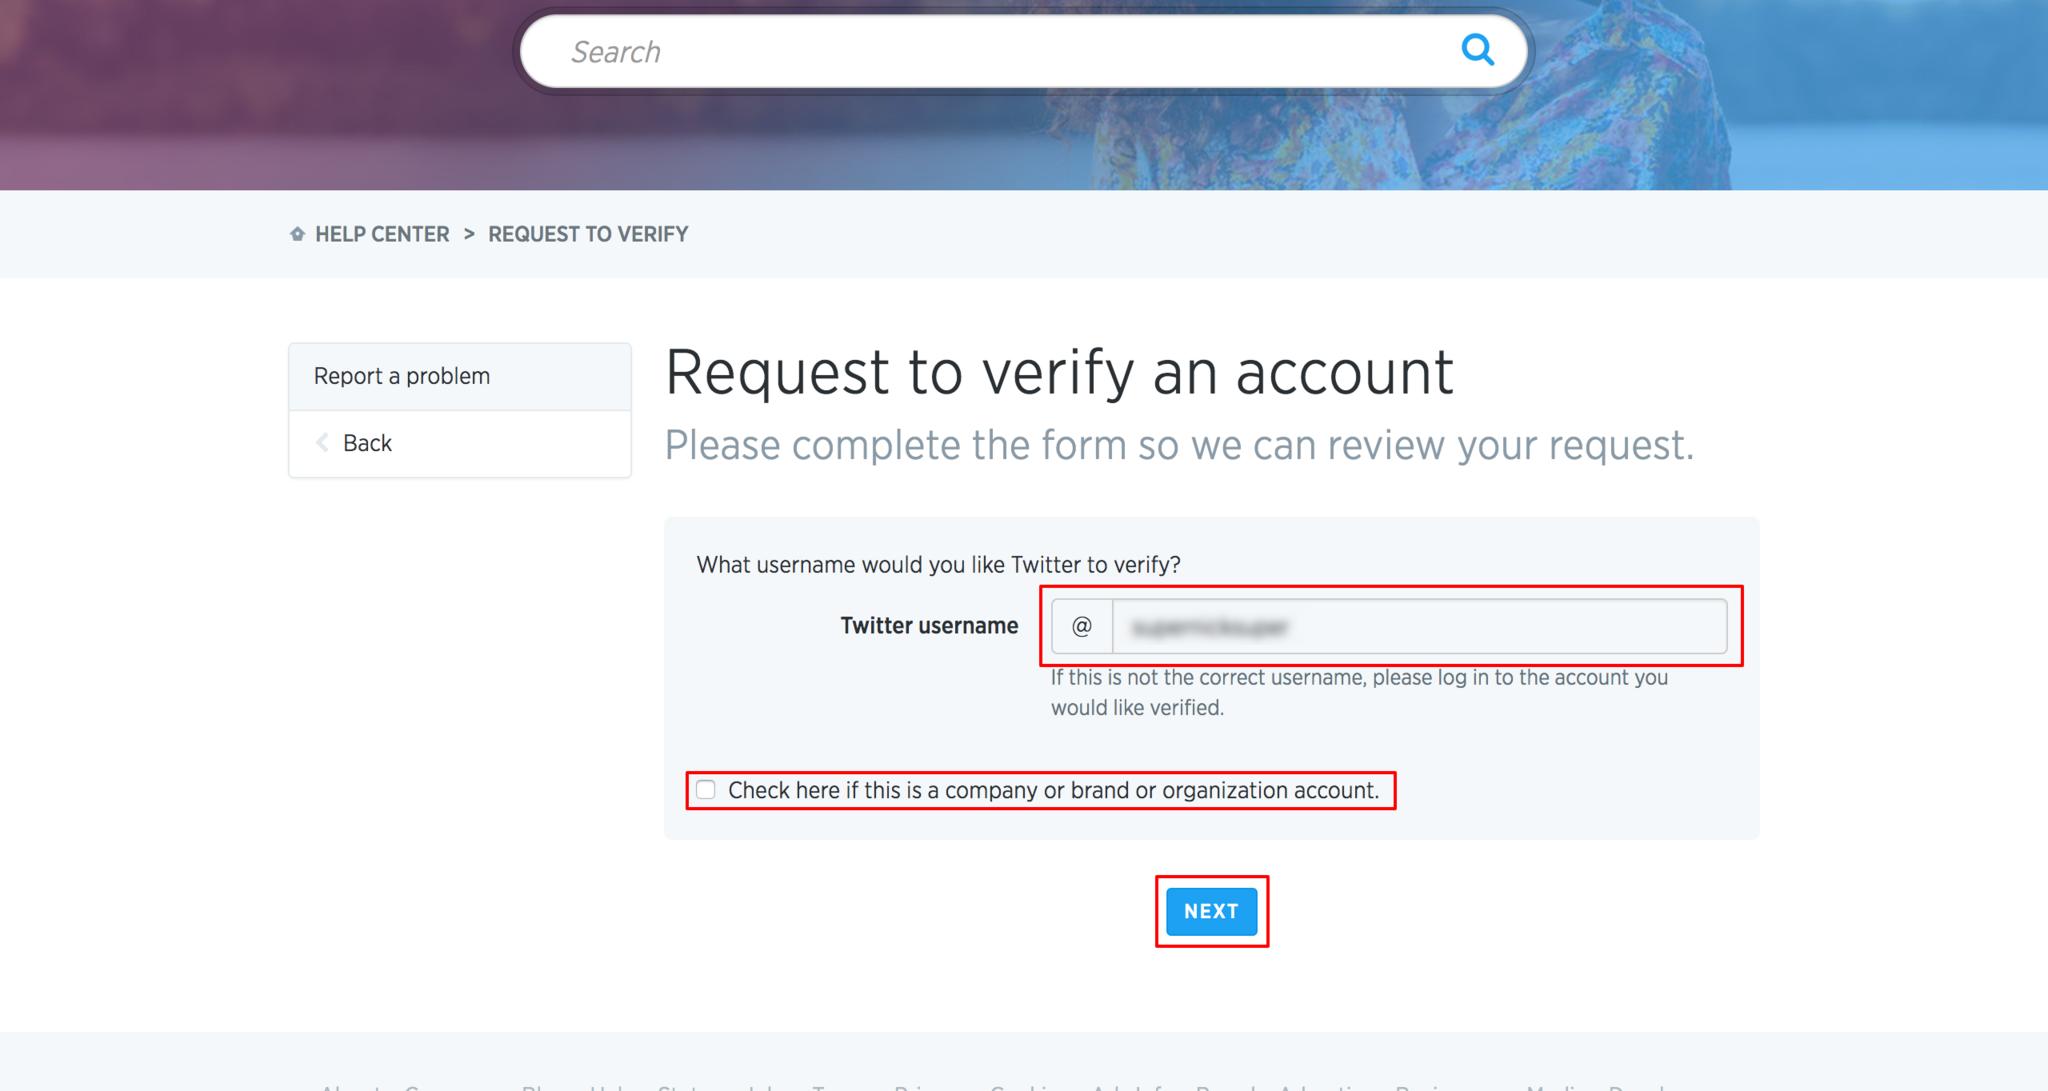 Twitter_Account_Verification_Request___Twitter_Help_Center_(1).png